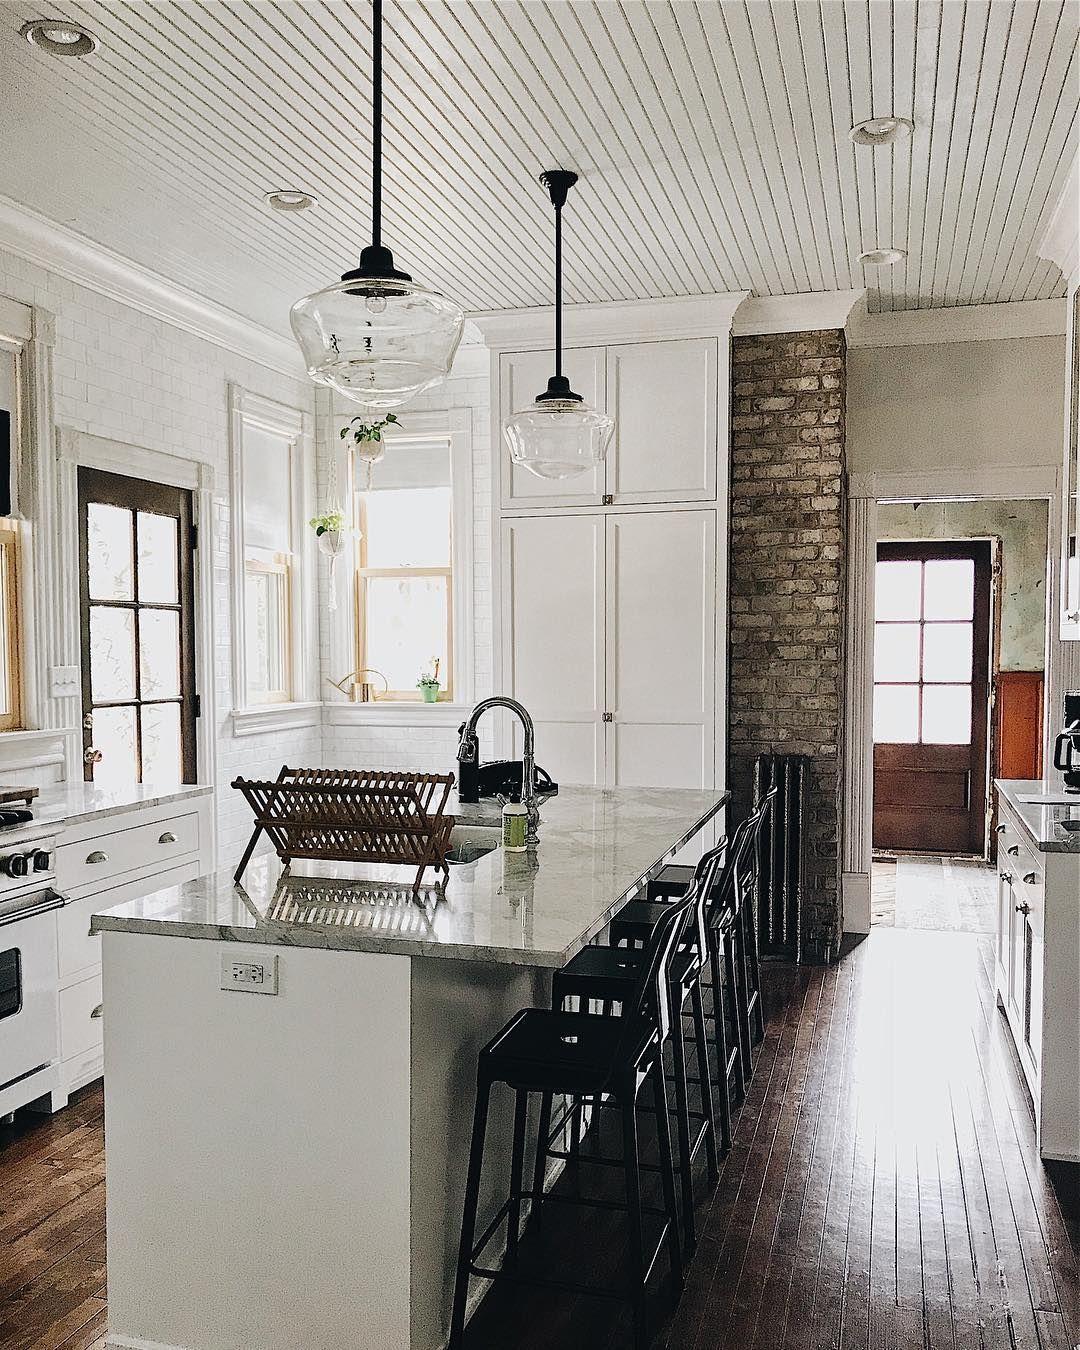 21 Victorian Style Kitchen Design And Ideas: The Victorian Farmhouse